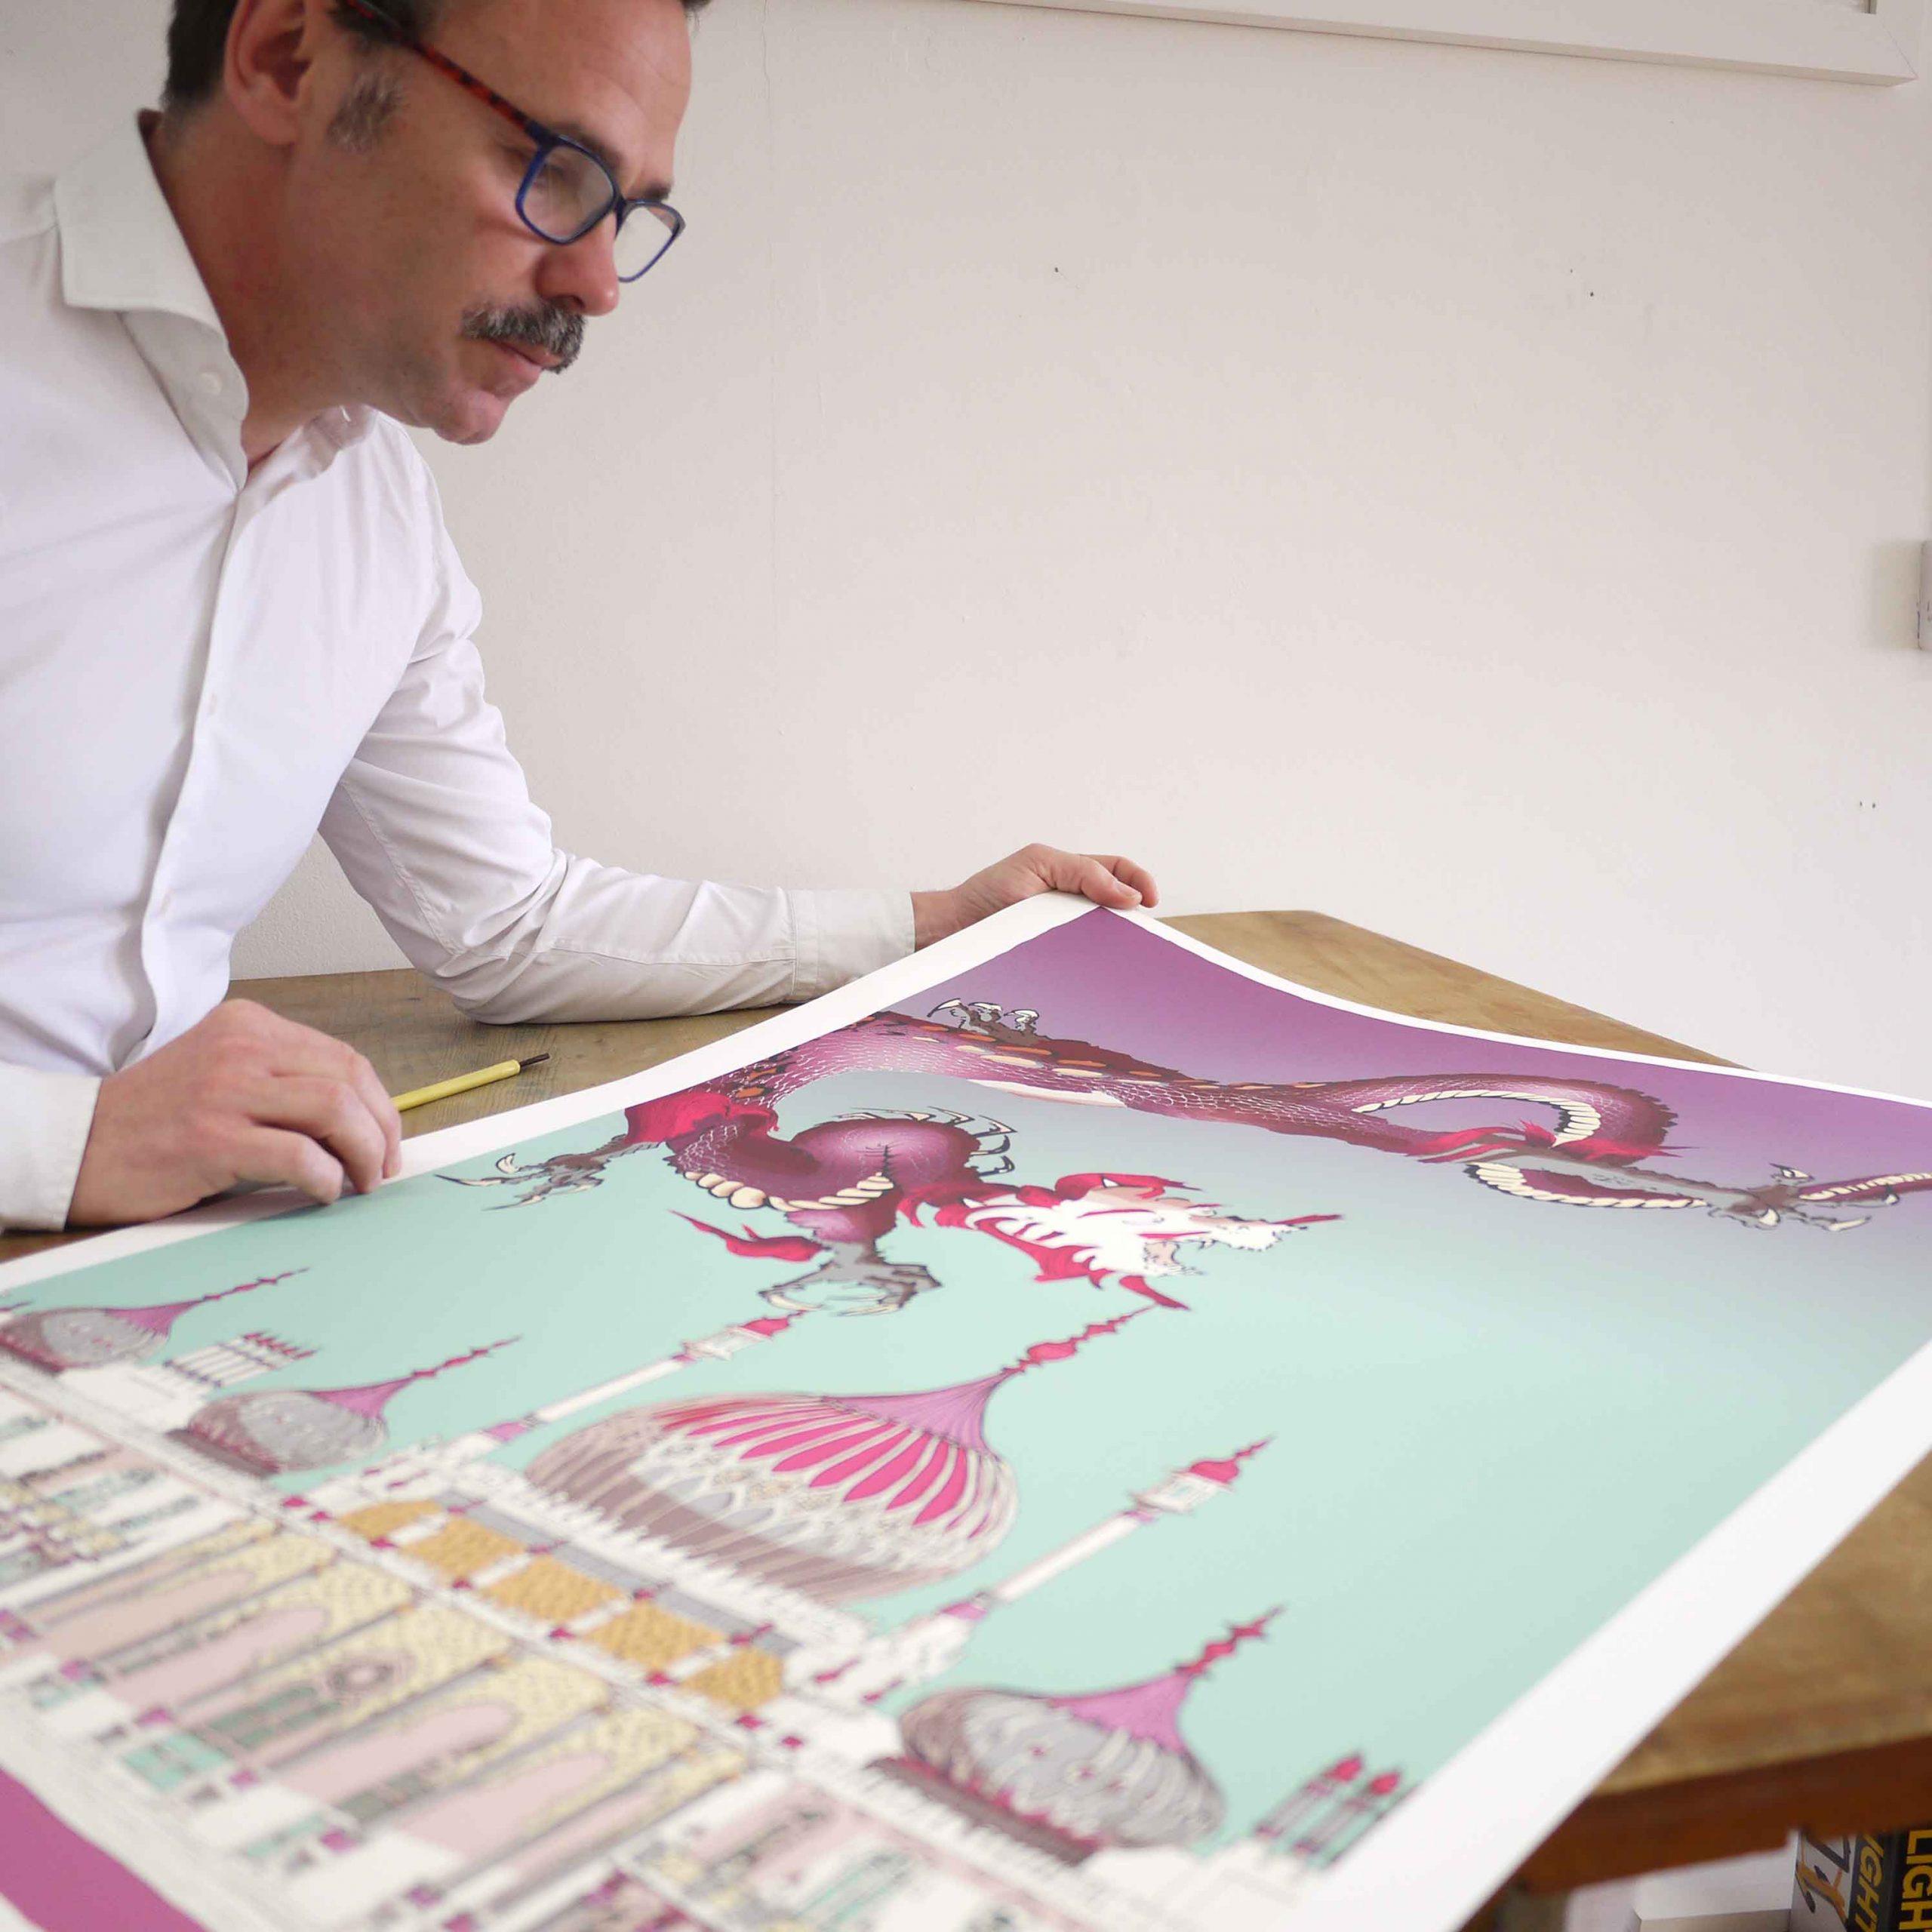 inspection of print named Chinoiseriez Life Joy by artist alej ez